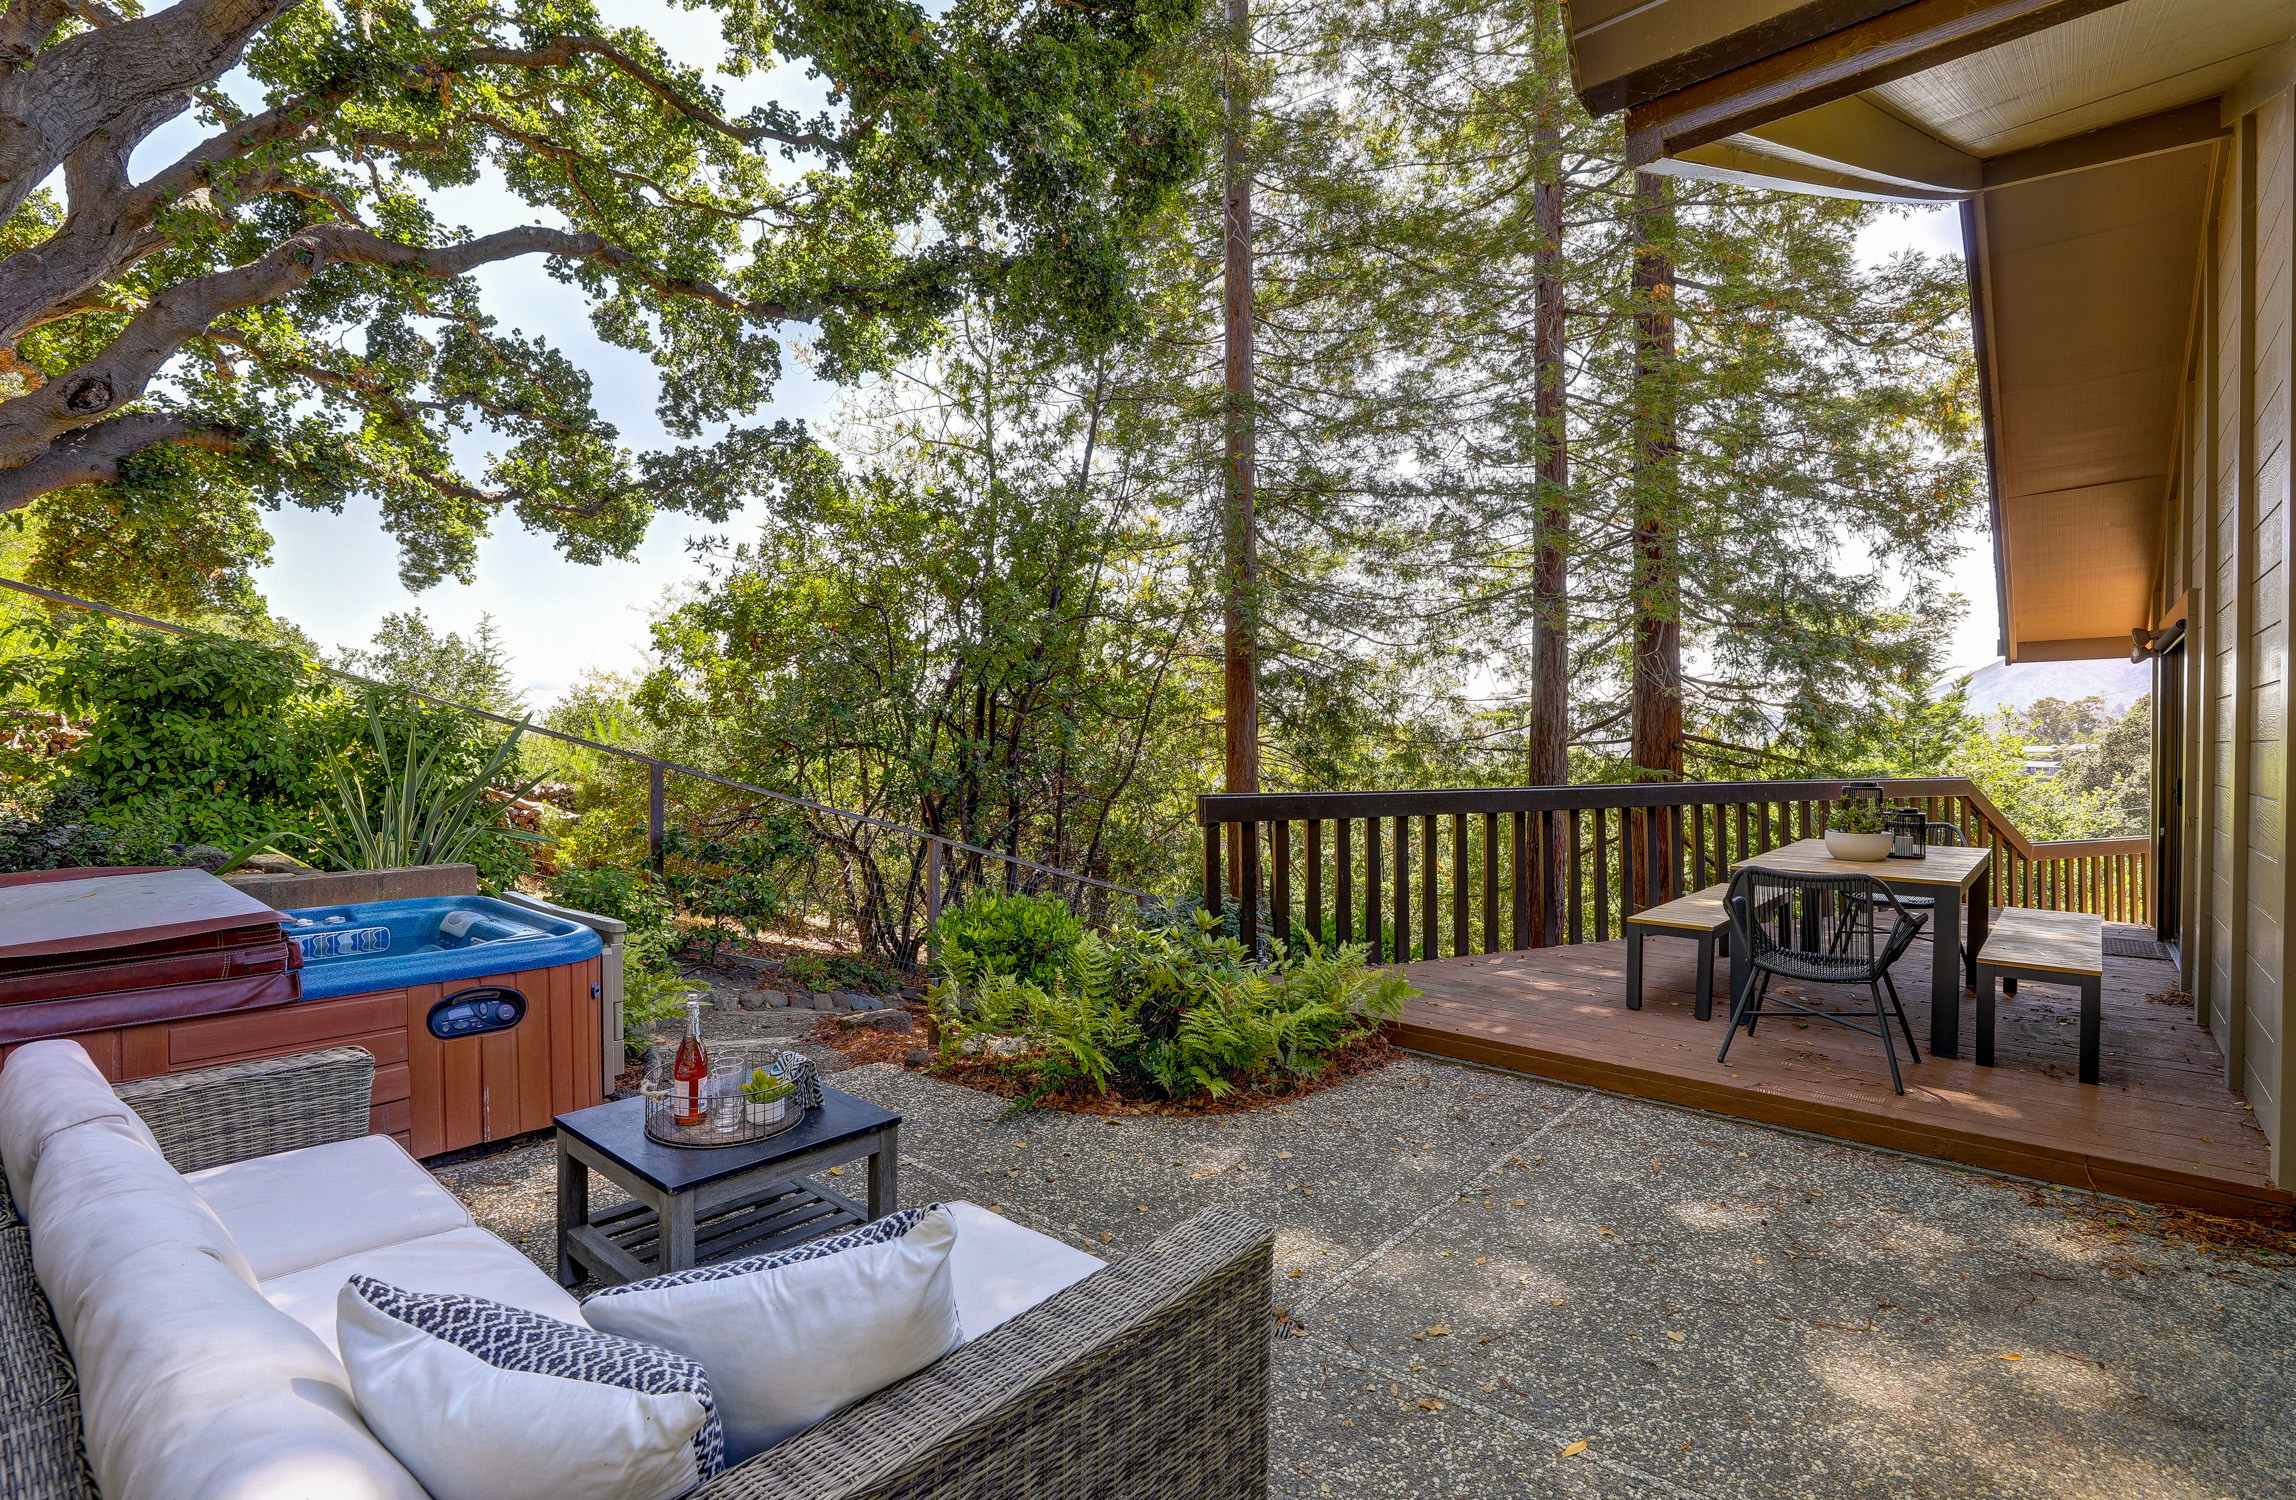 16Dorian 62 MLSSan Rafael Real Estate - Listed by Julia Fitzpatrick + Allie Fornesi Team Own Marin County .jpg